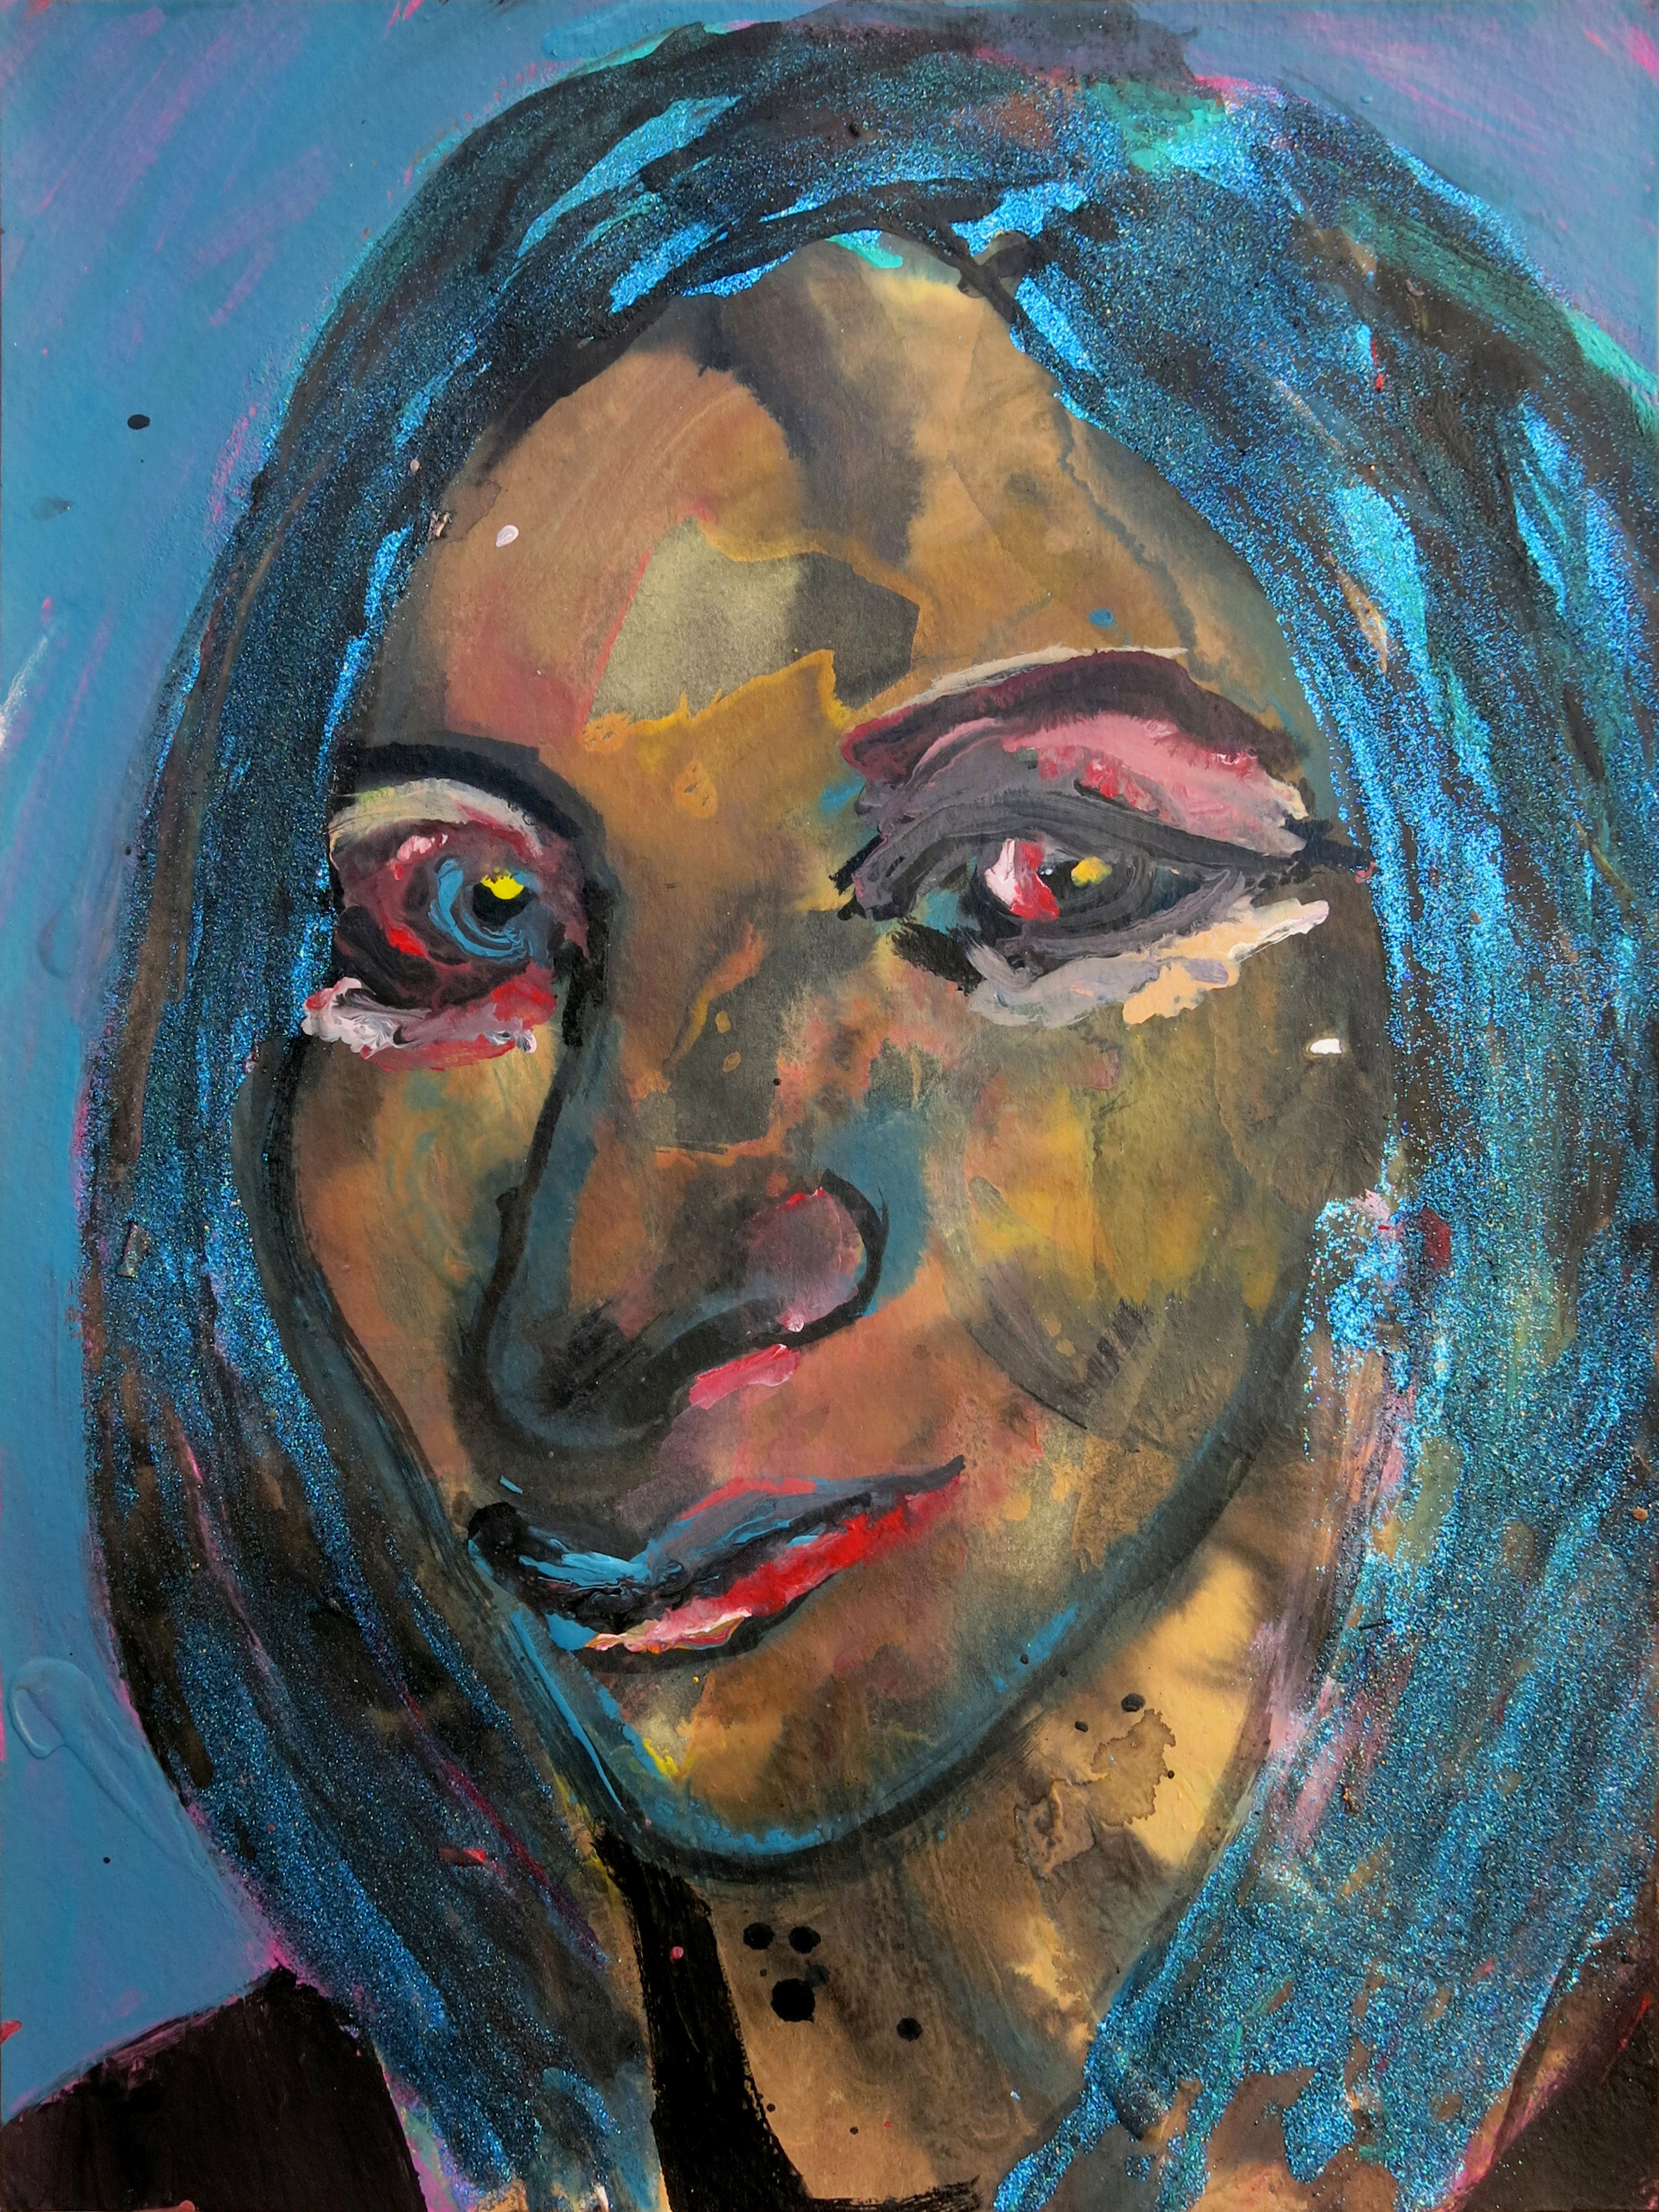 Barbra Streisand Portrait #209